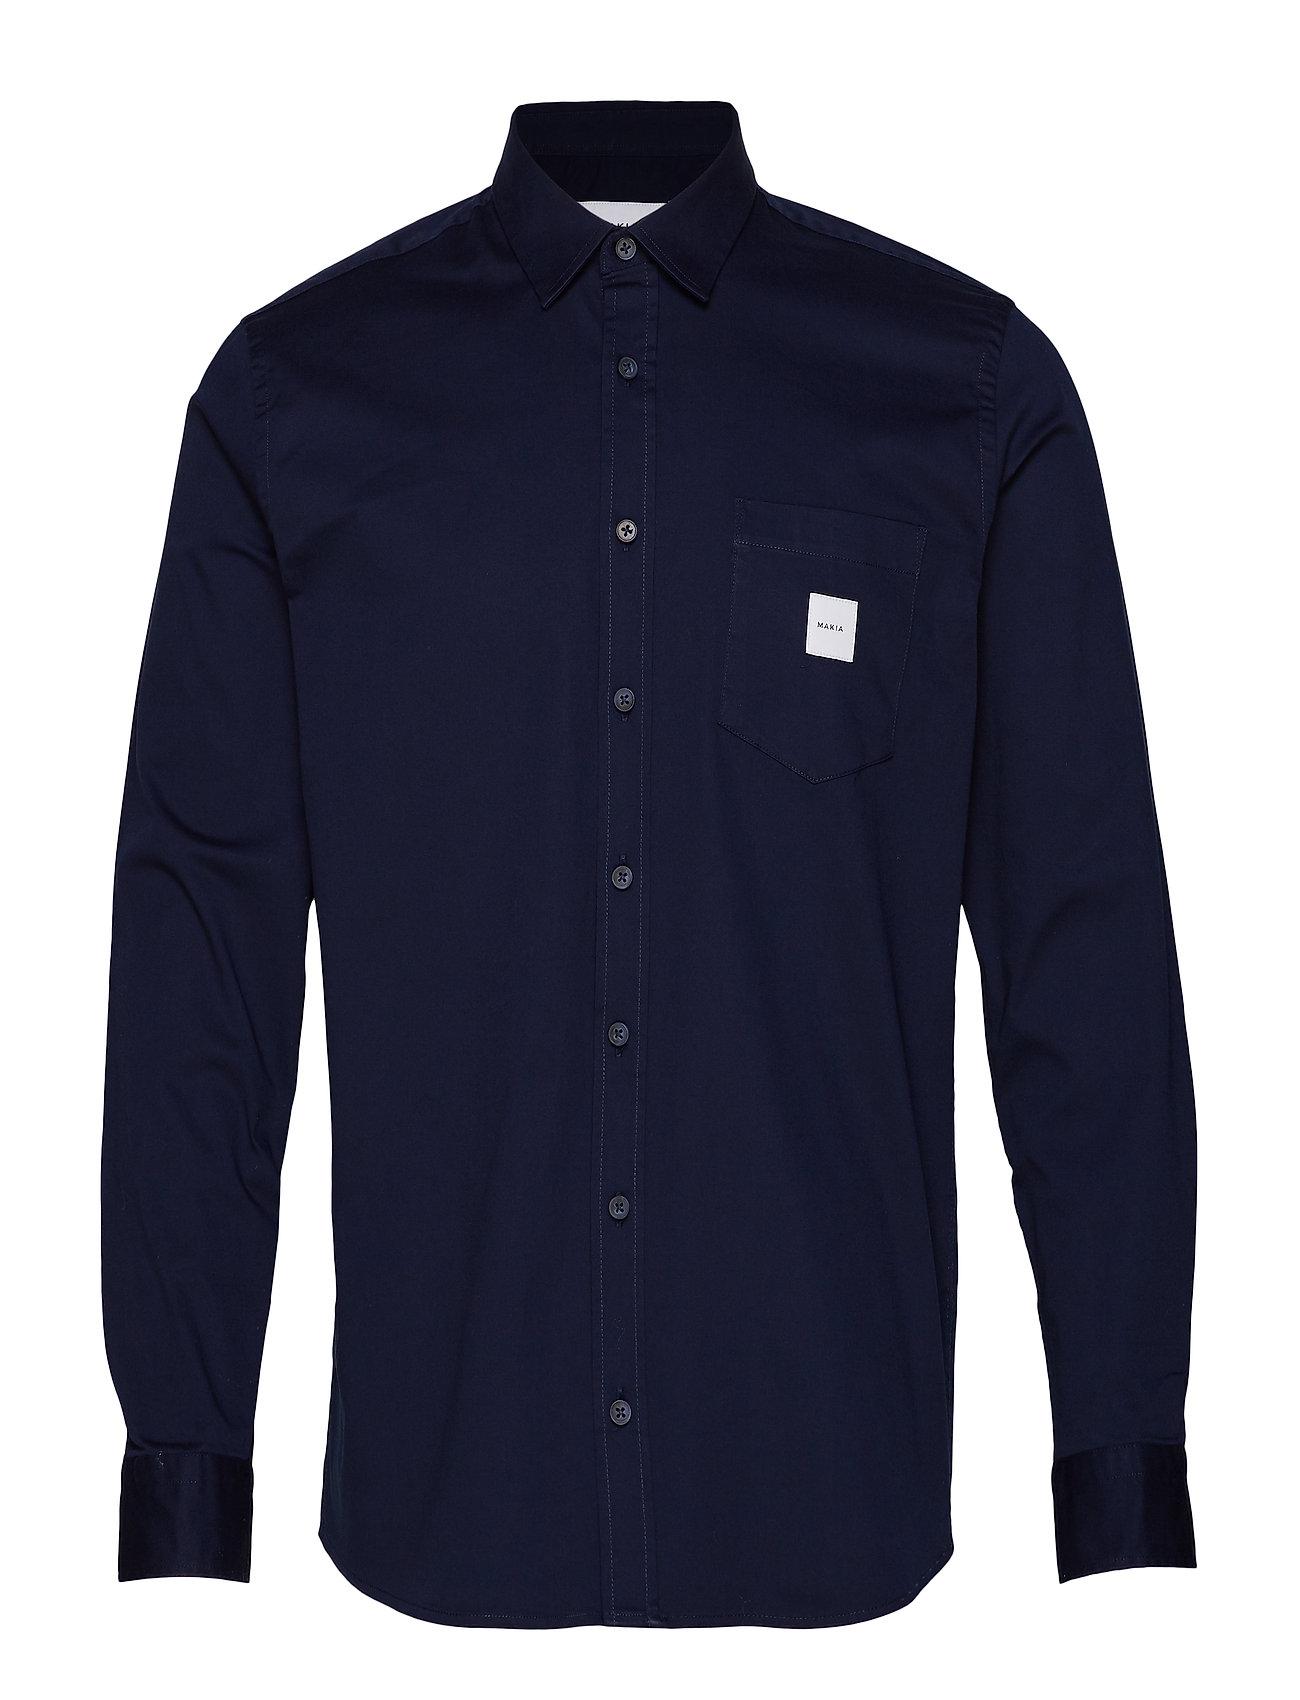 Makia Square Pocket Shirt - DARK NAVY